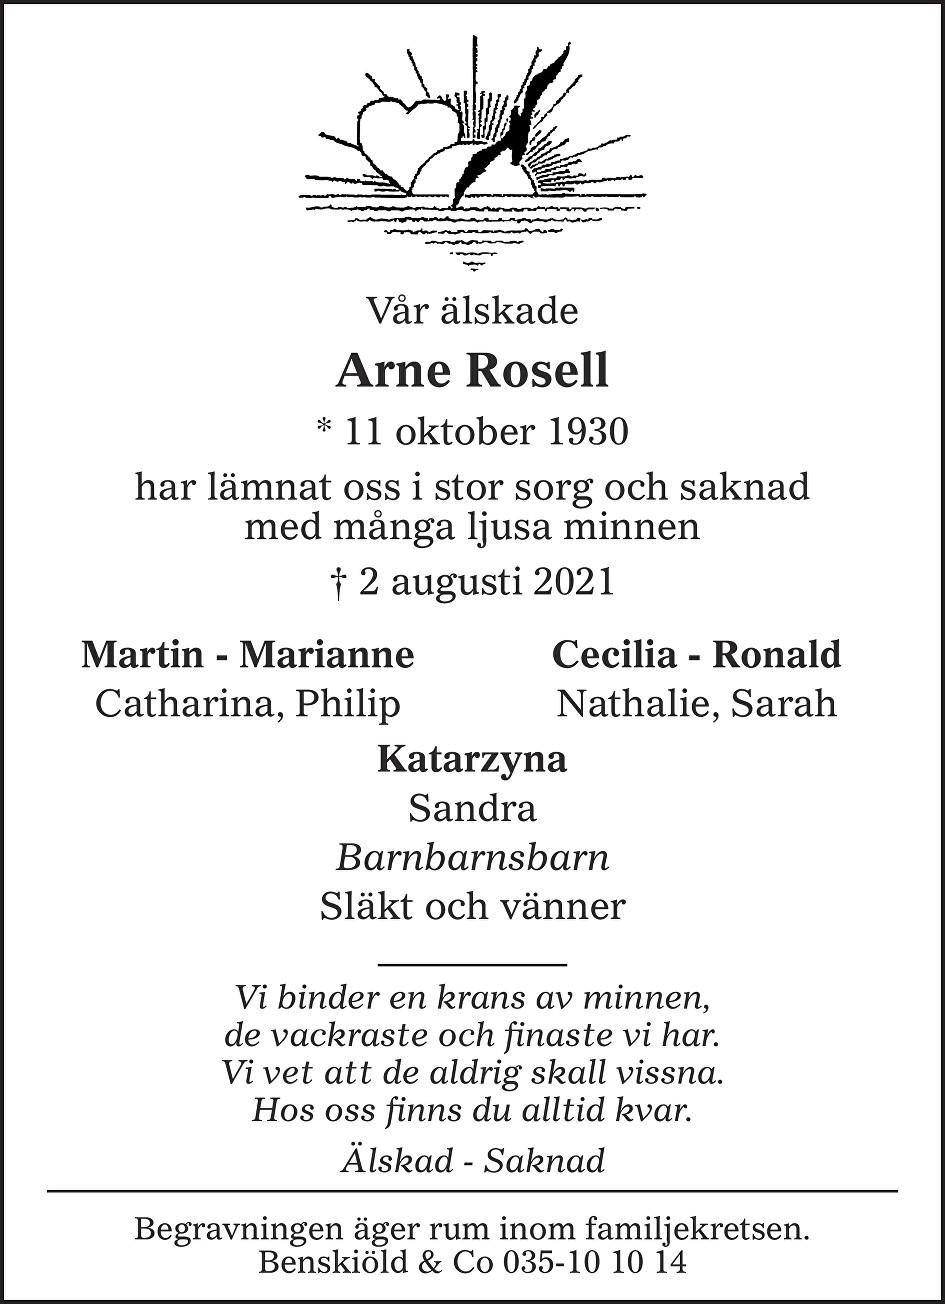 Arne Rosell Death notice